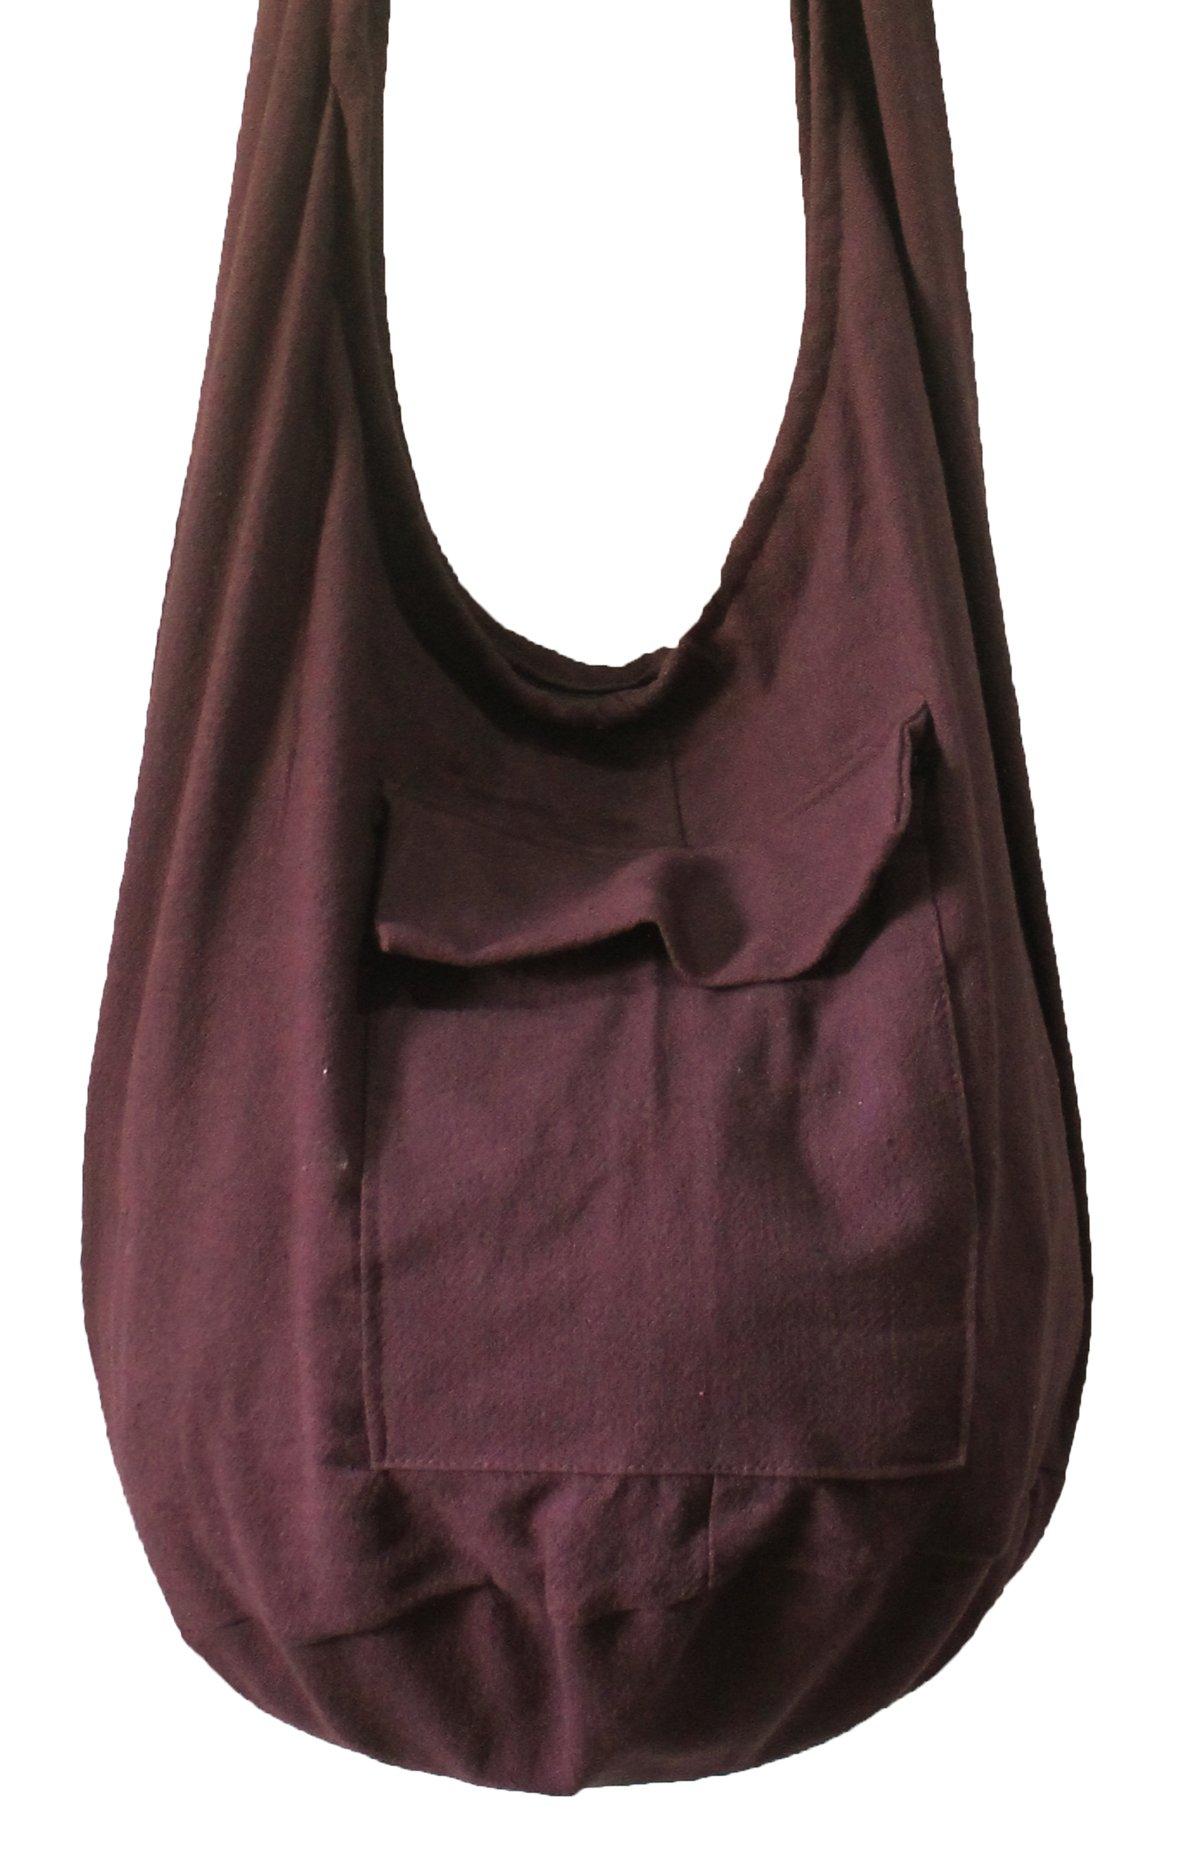 Thai Bag Tribal Bag Hmong Bag Boho Bag Striped Bag Ethnic Striped Thai Cotton Boho Sling Tribal Crossbody Bag Shoulder Bag Thai Pattern Bag Thai Top Zip Handmade Asia Bag (Dark Purple)